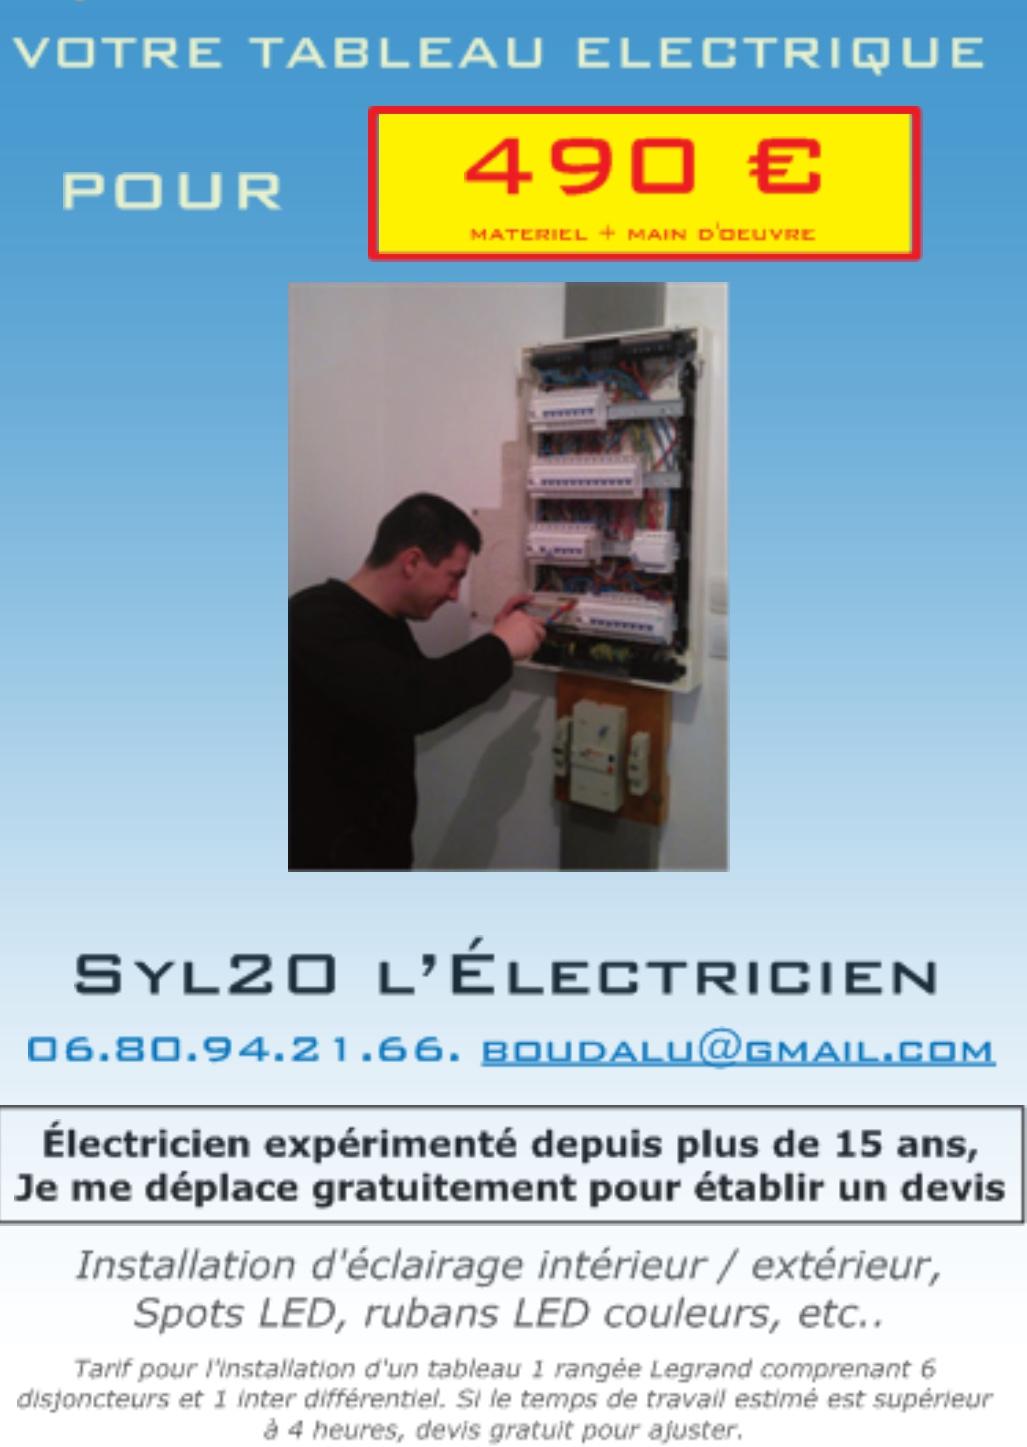 SYL20 L'ELECTRICIEN